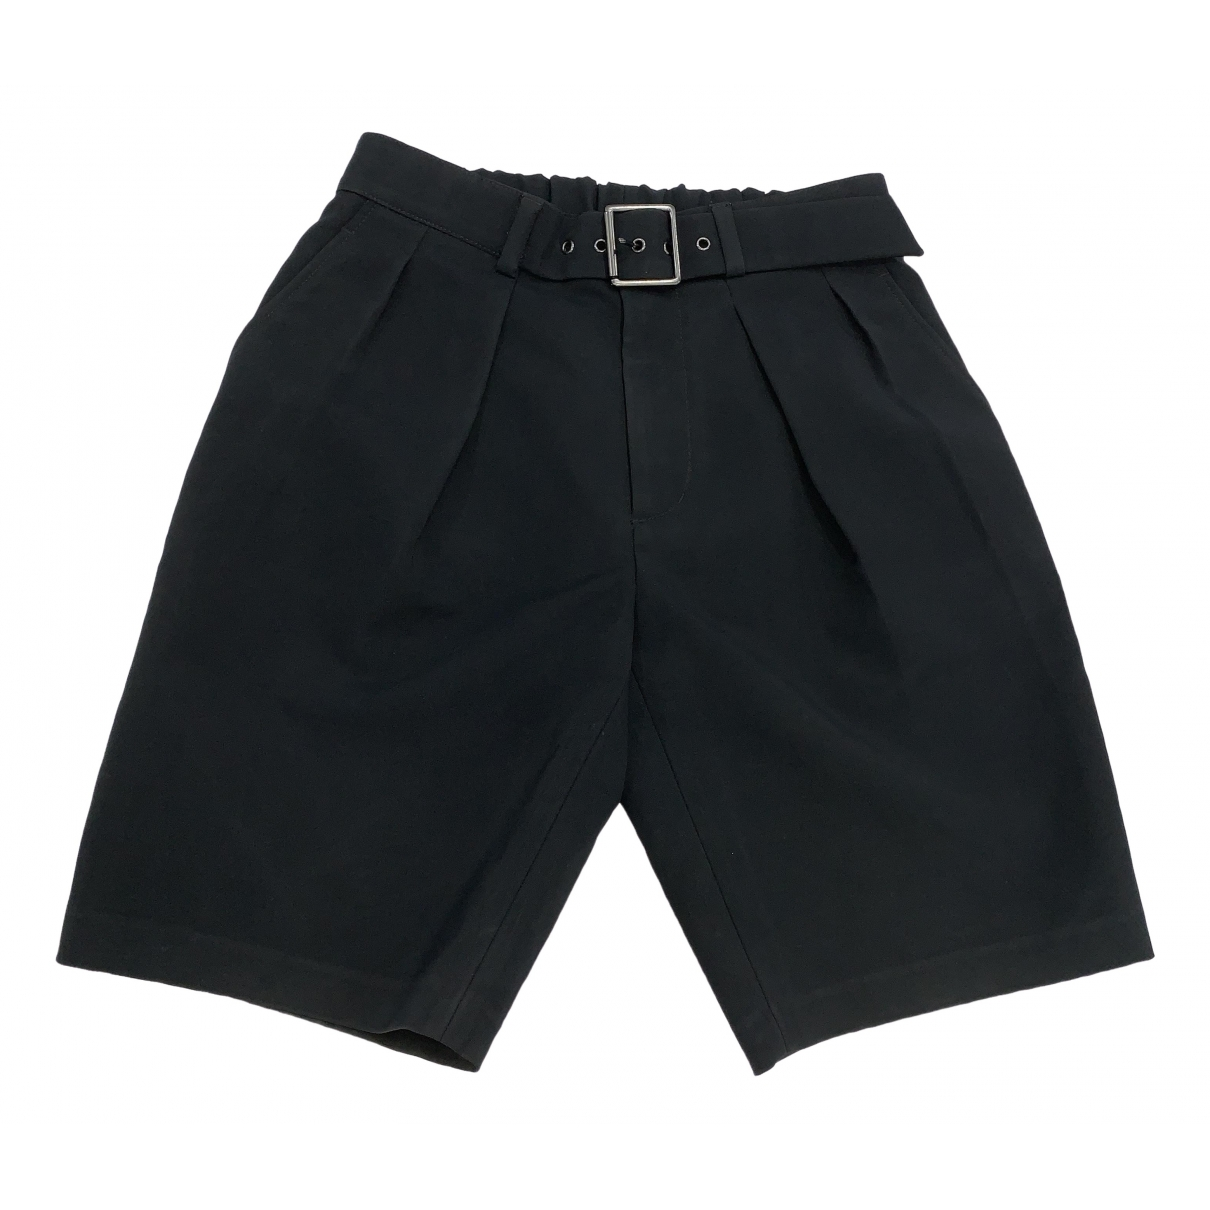 3.1 Phillip Lim \N Shorts in  Schwarz Synthetik